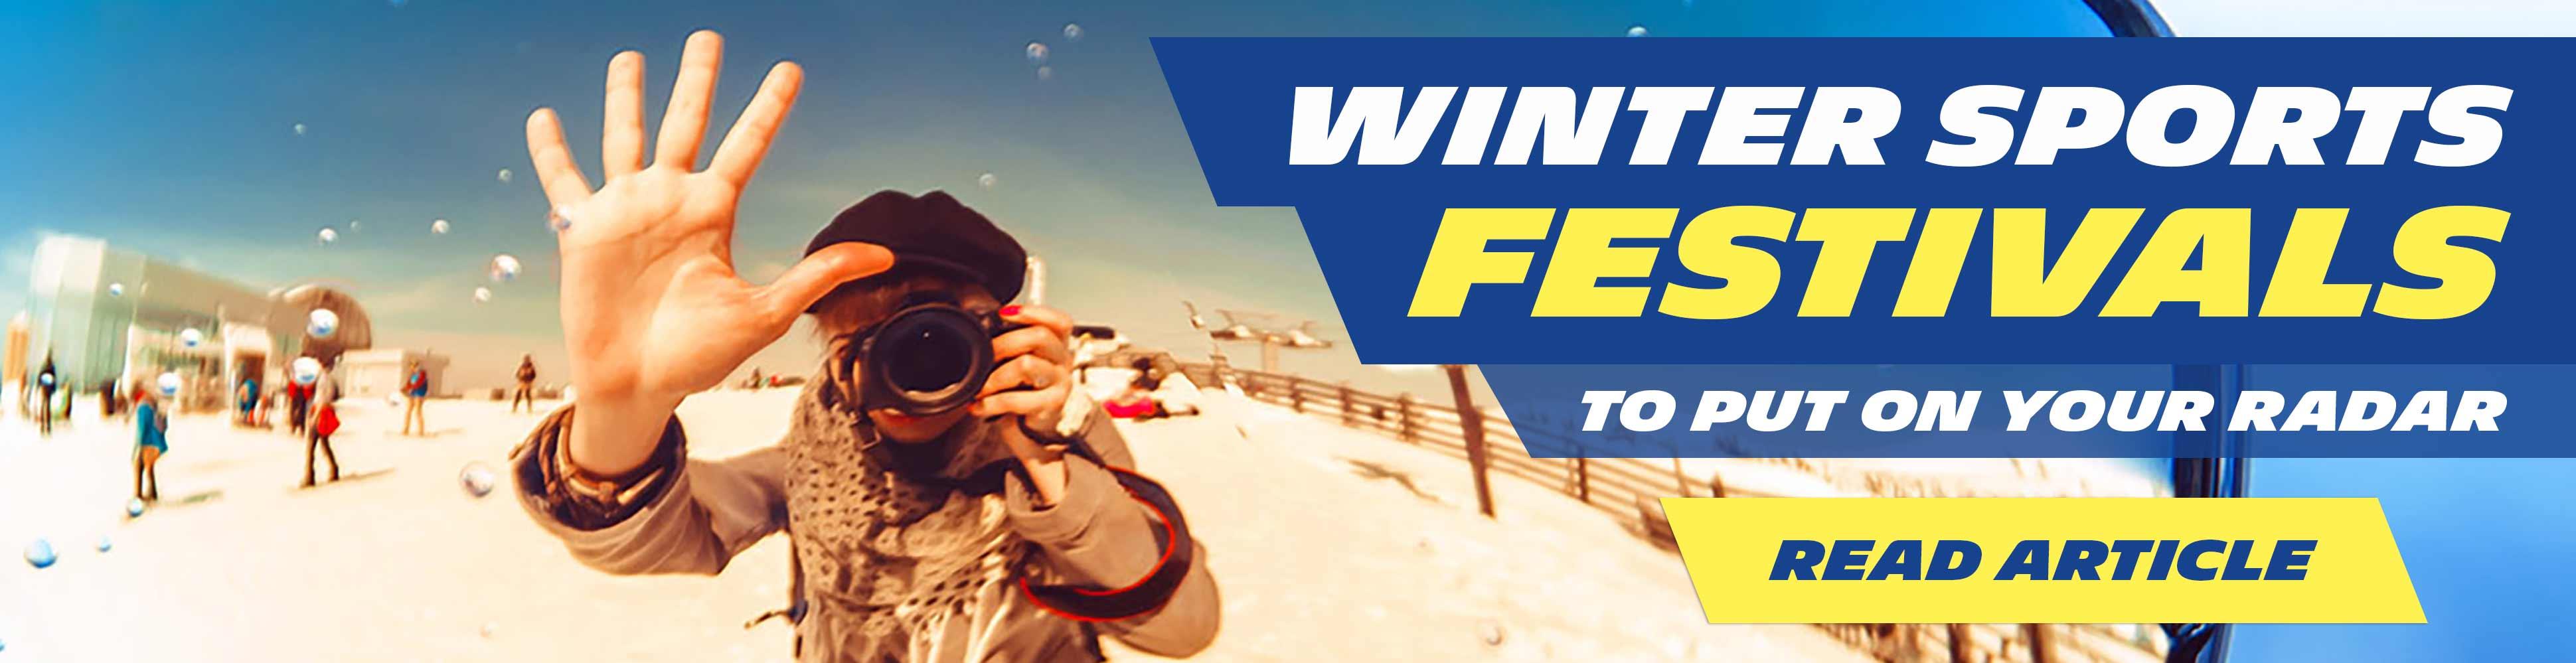 Winter Sports Festivals